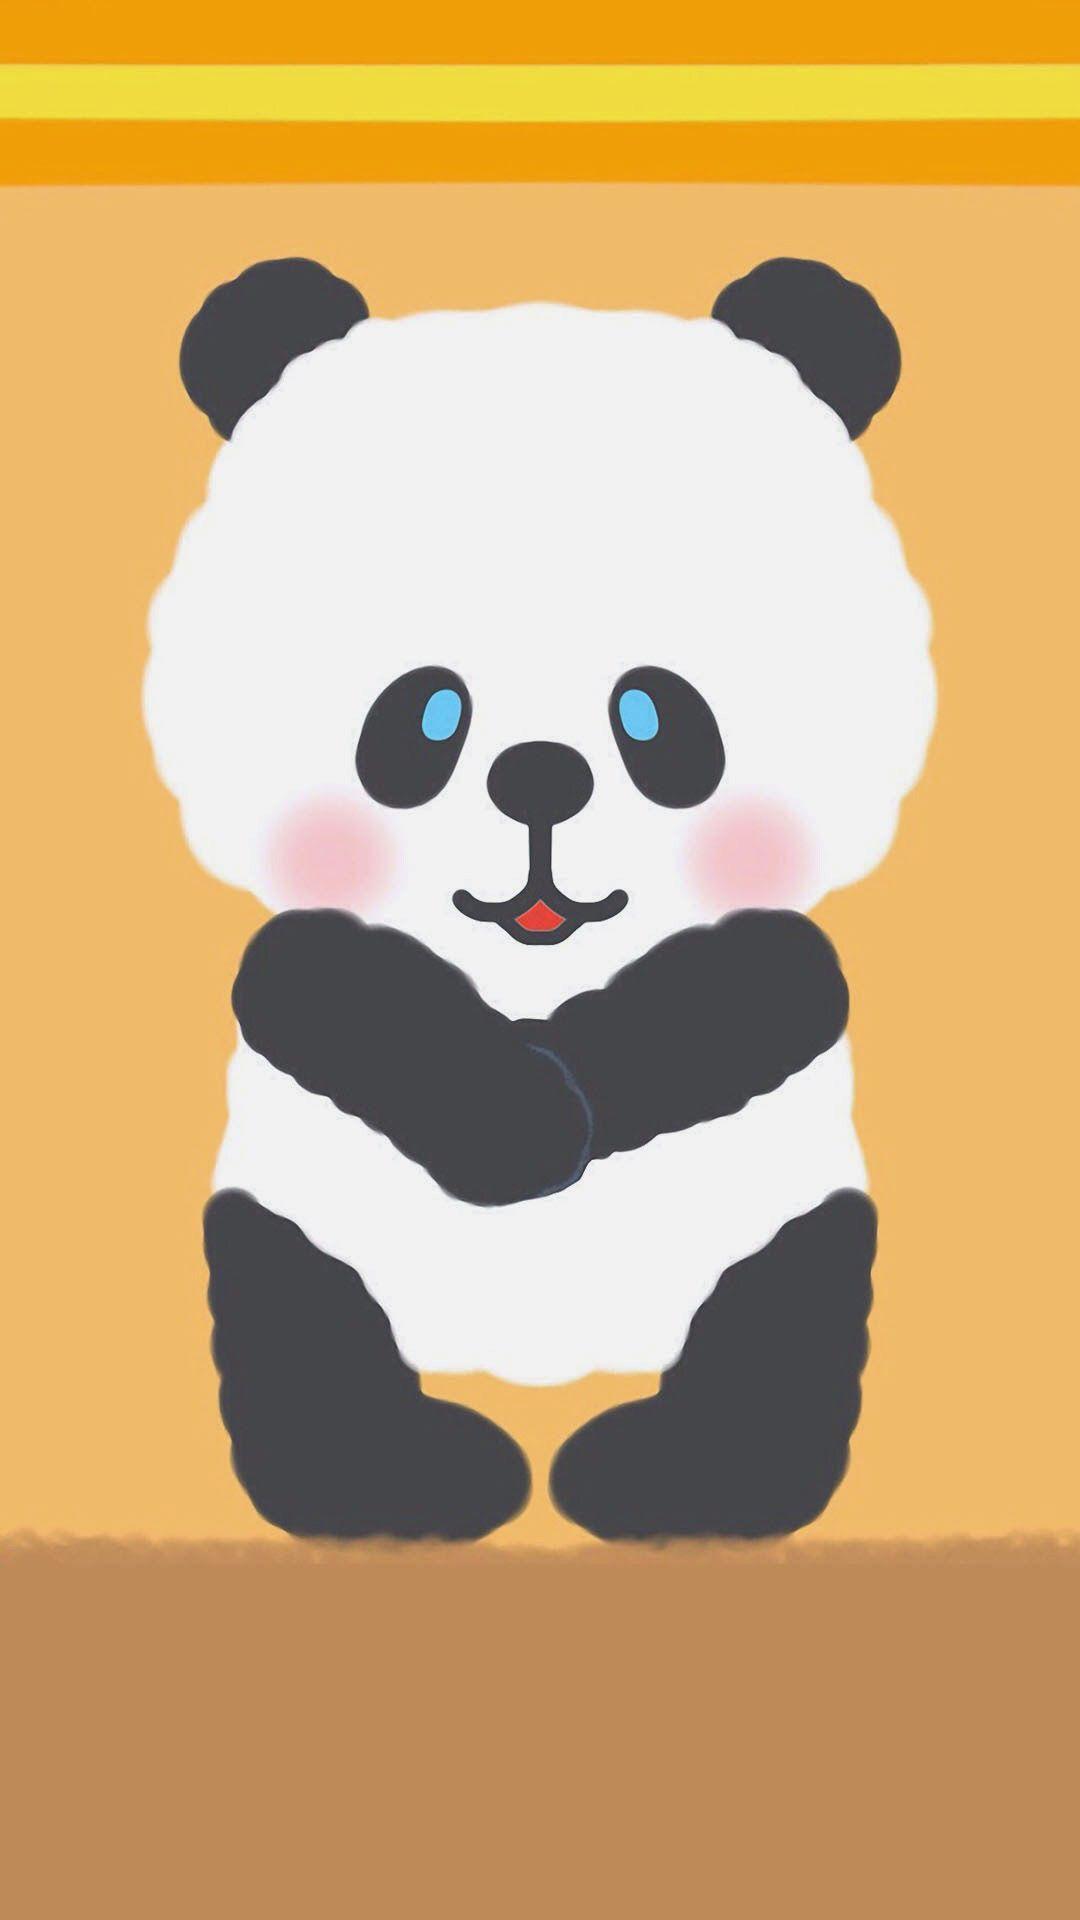 Pin de Ceyda CAR en Panda | Pinterest